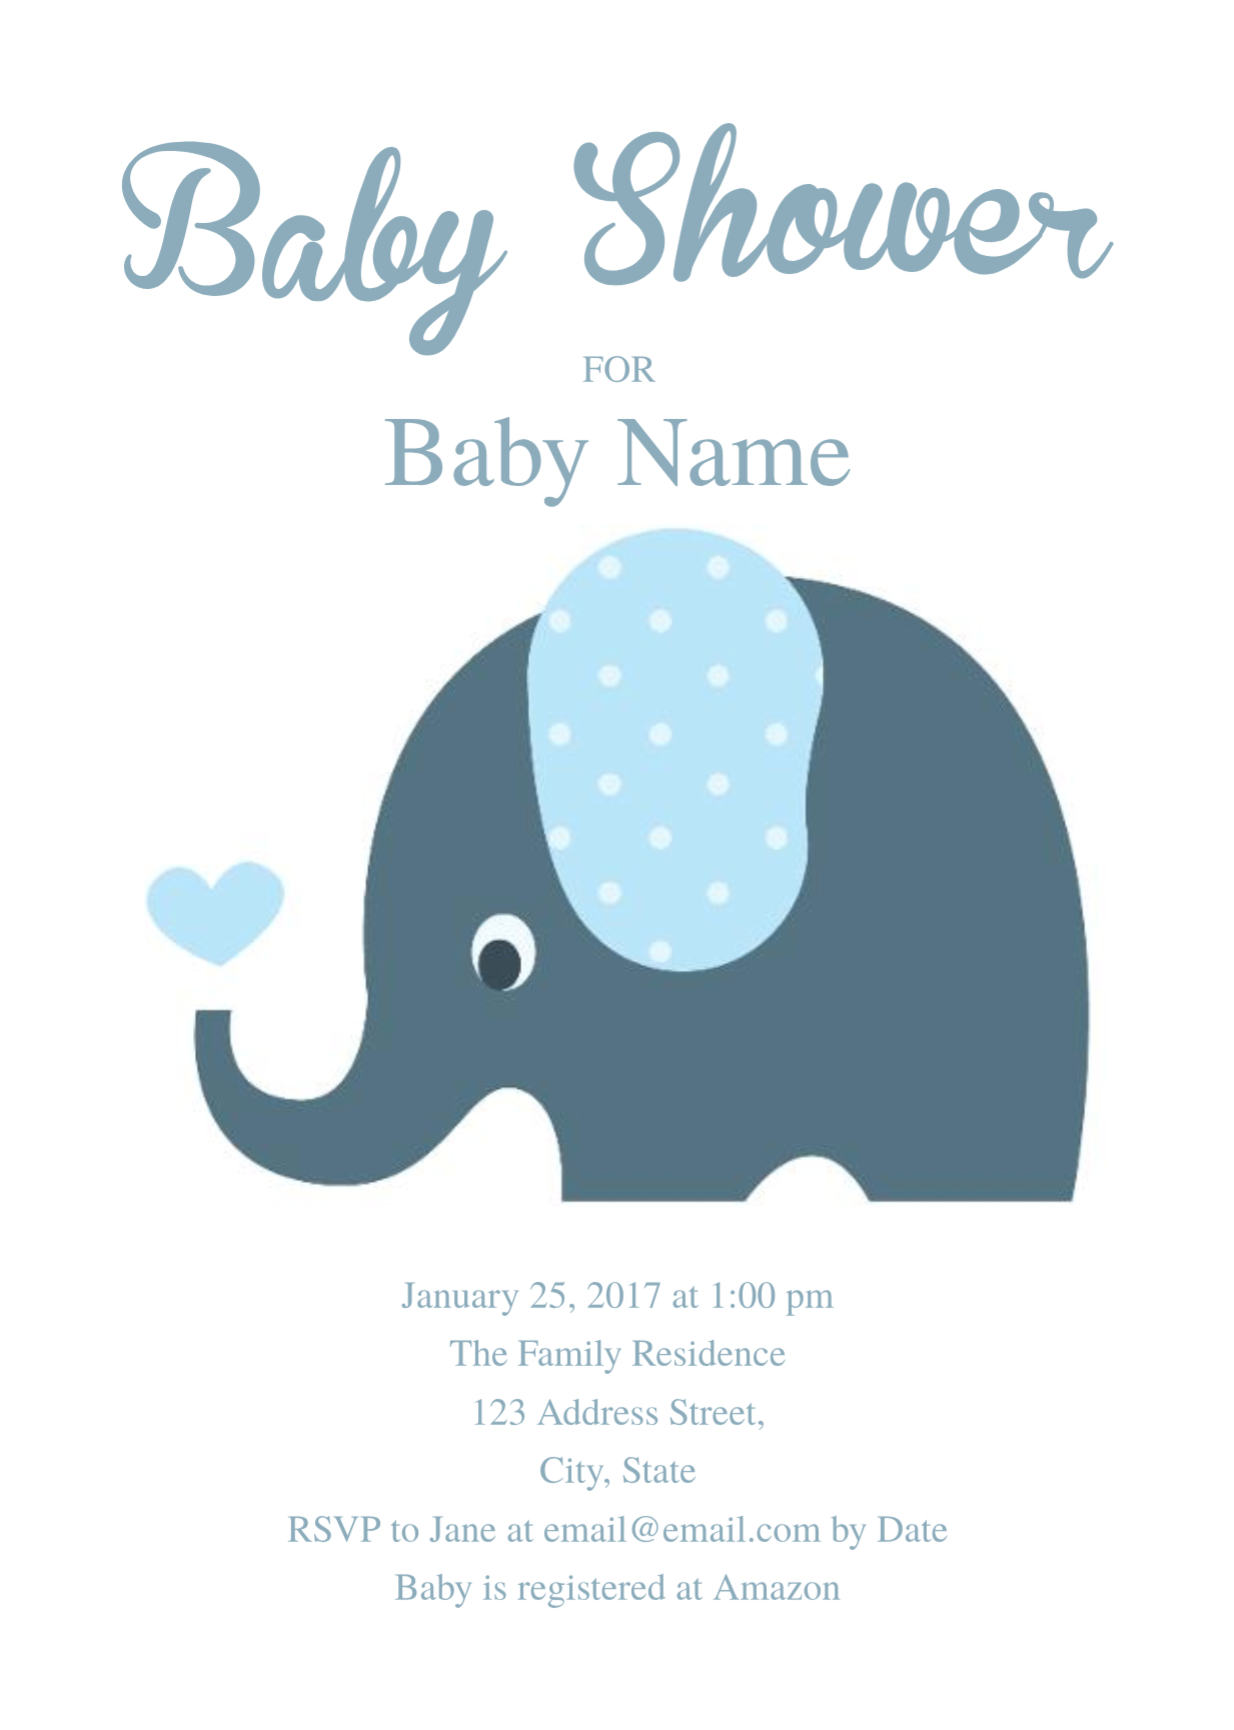 Cute Elephant Baby Shower Invitation Template | Free Invitation - Free Printable Elephant Baby Shower Invitations